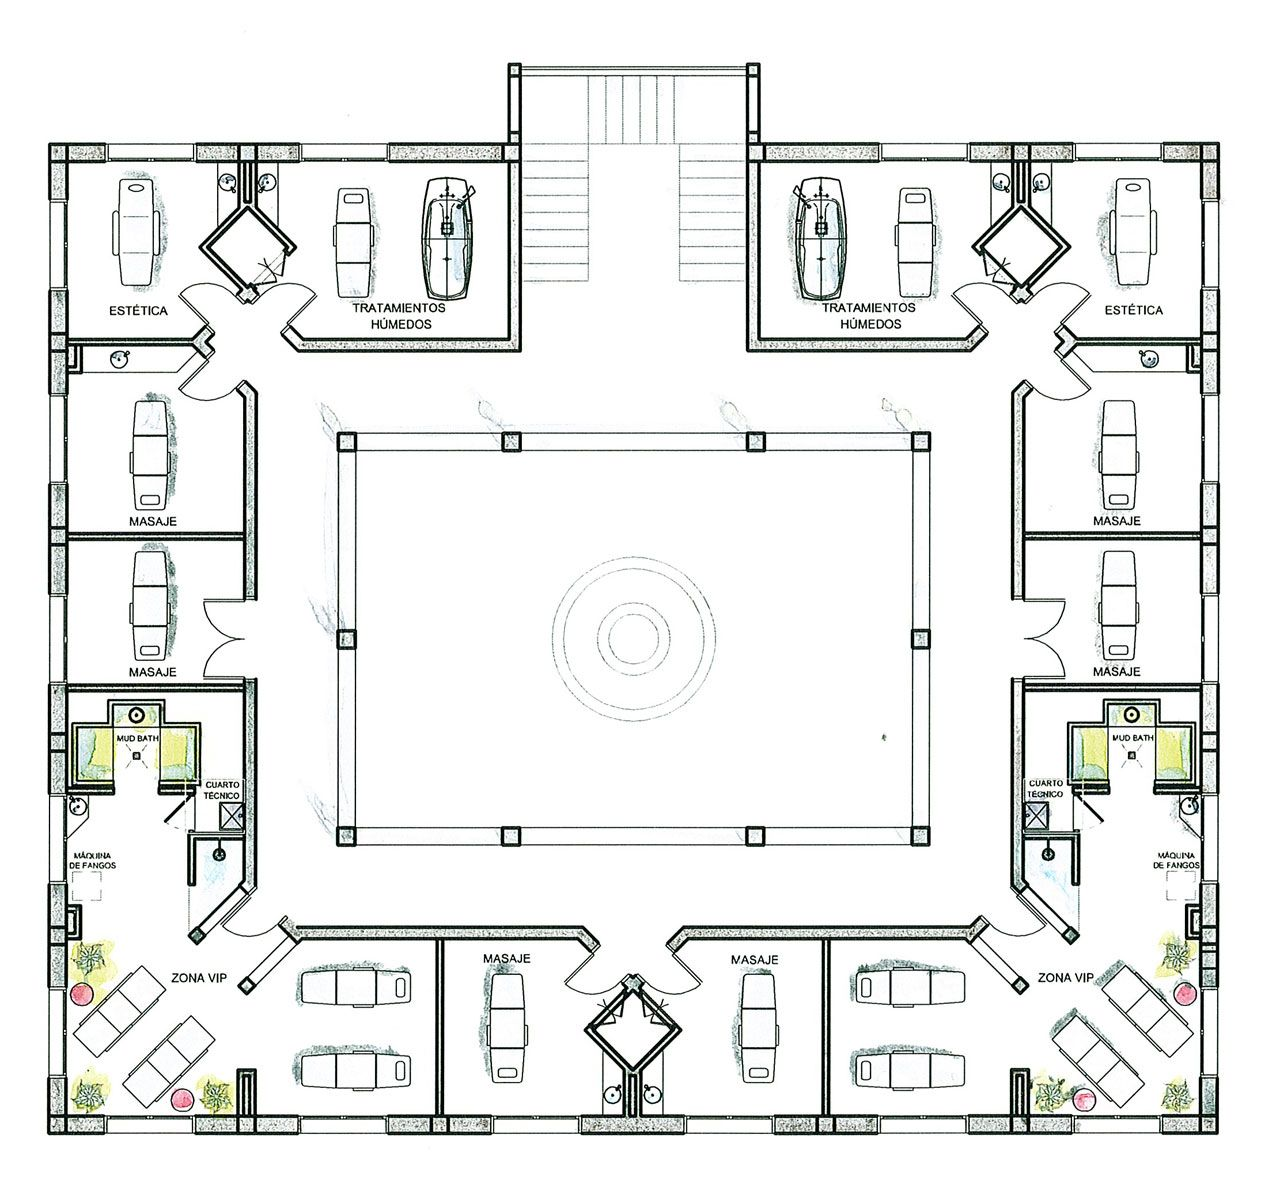 Proyectos destacados majestic elegance planos for Oficinas modernas planos